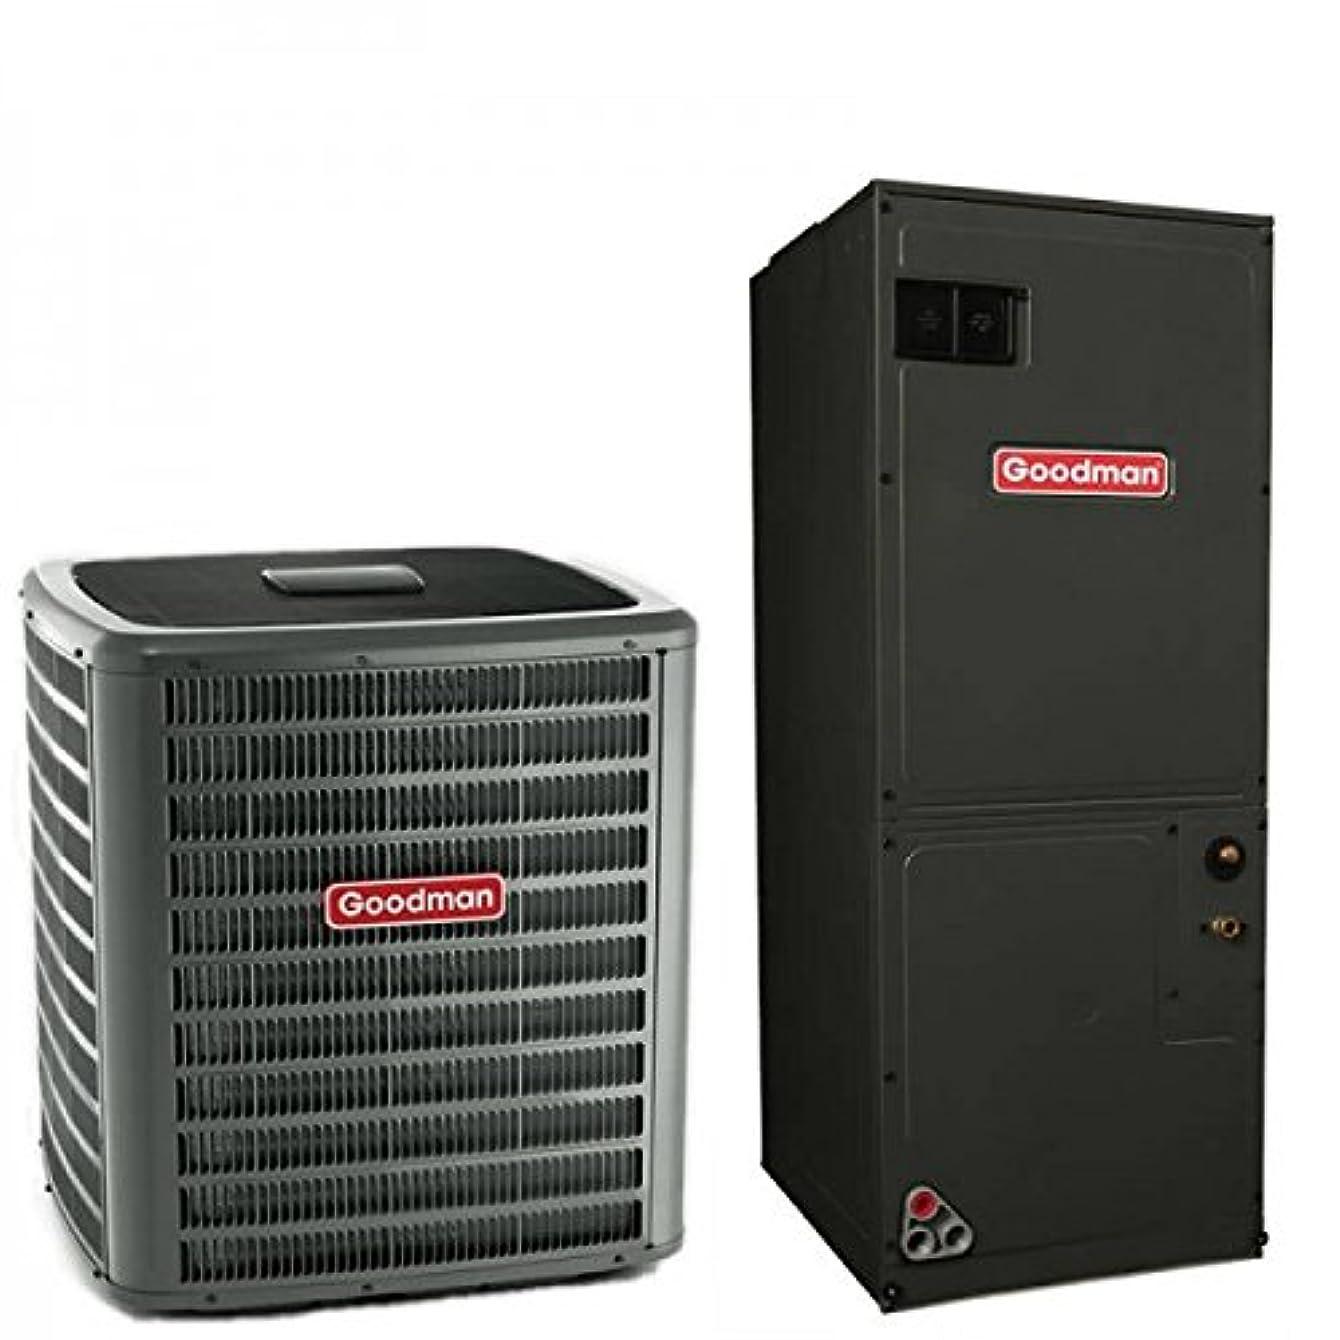 3.5 Ton Goodman 14 SEER R410A Air Conditioner Split System (15 Kilowatt)